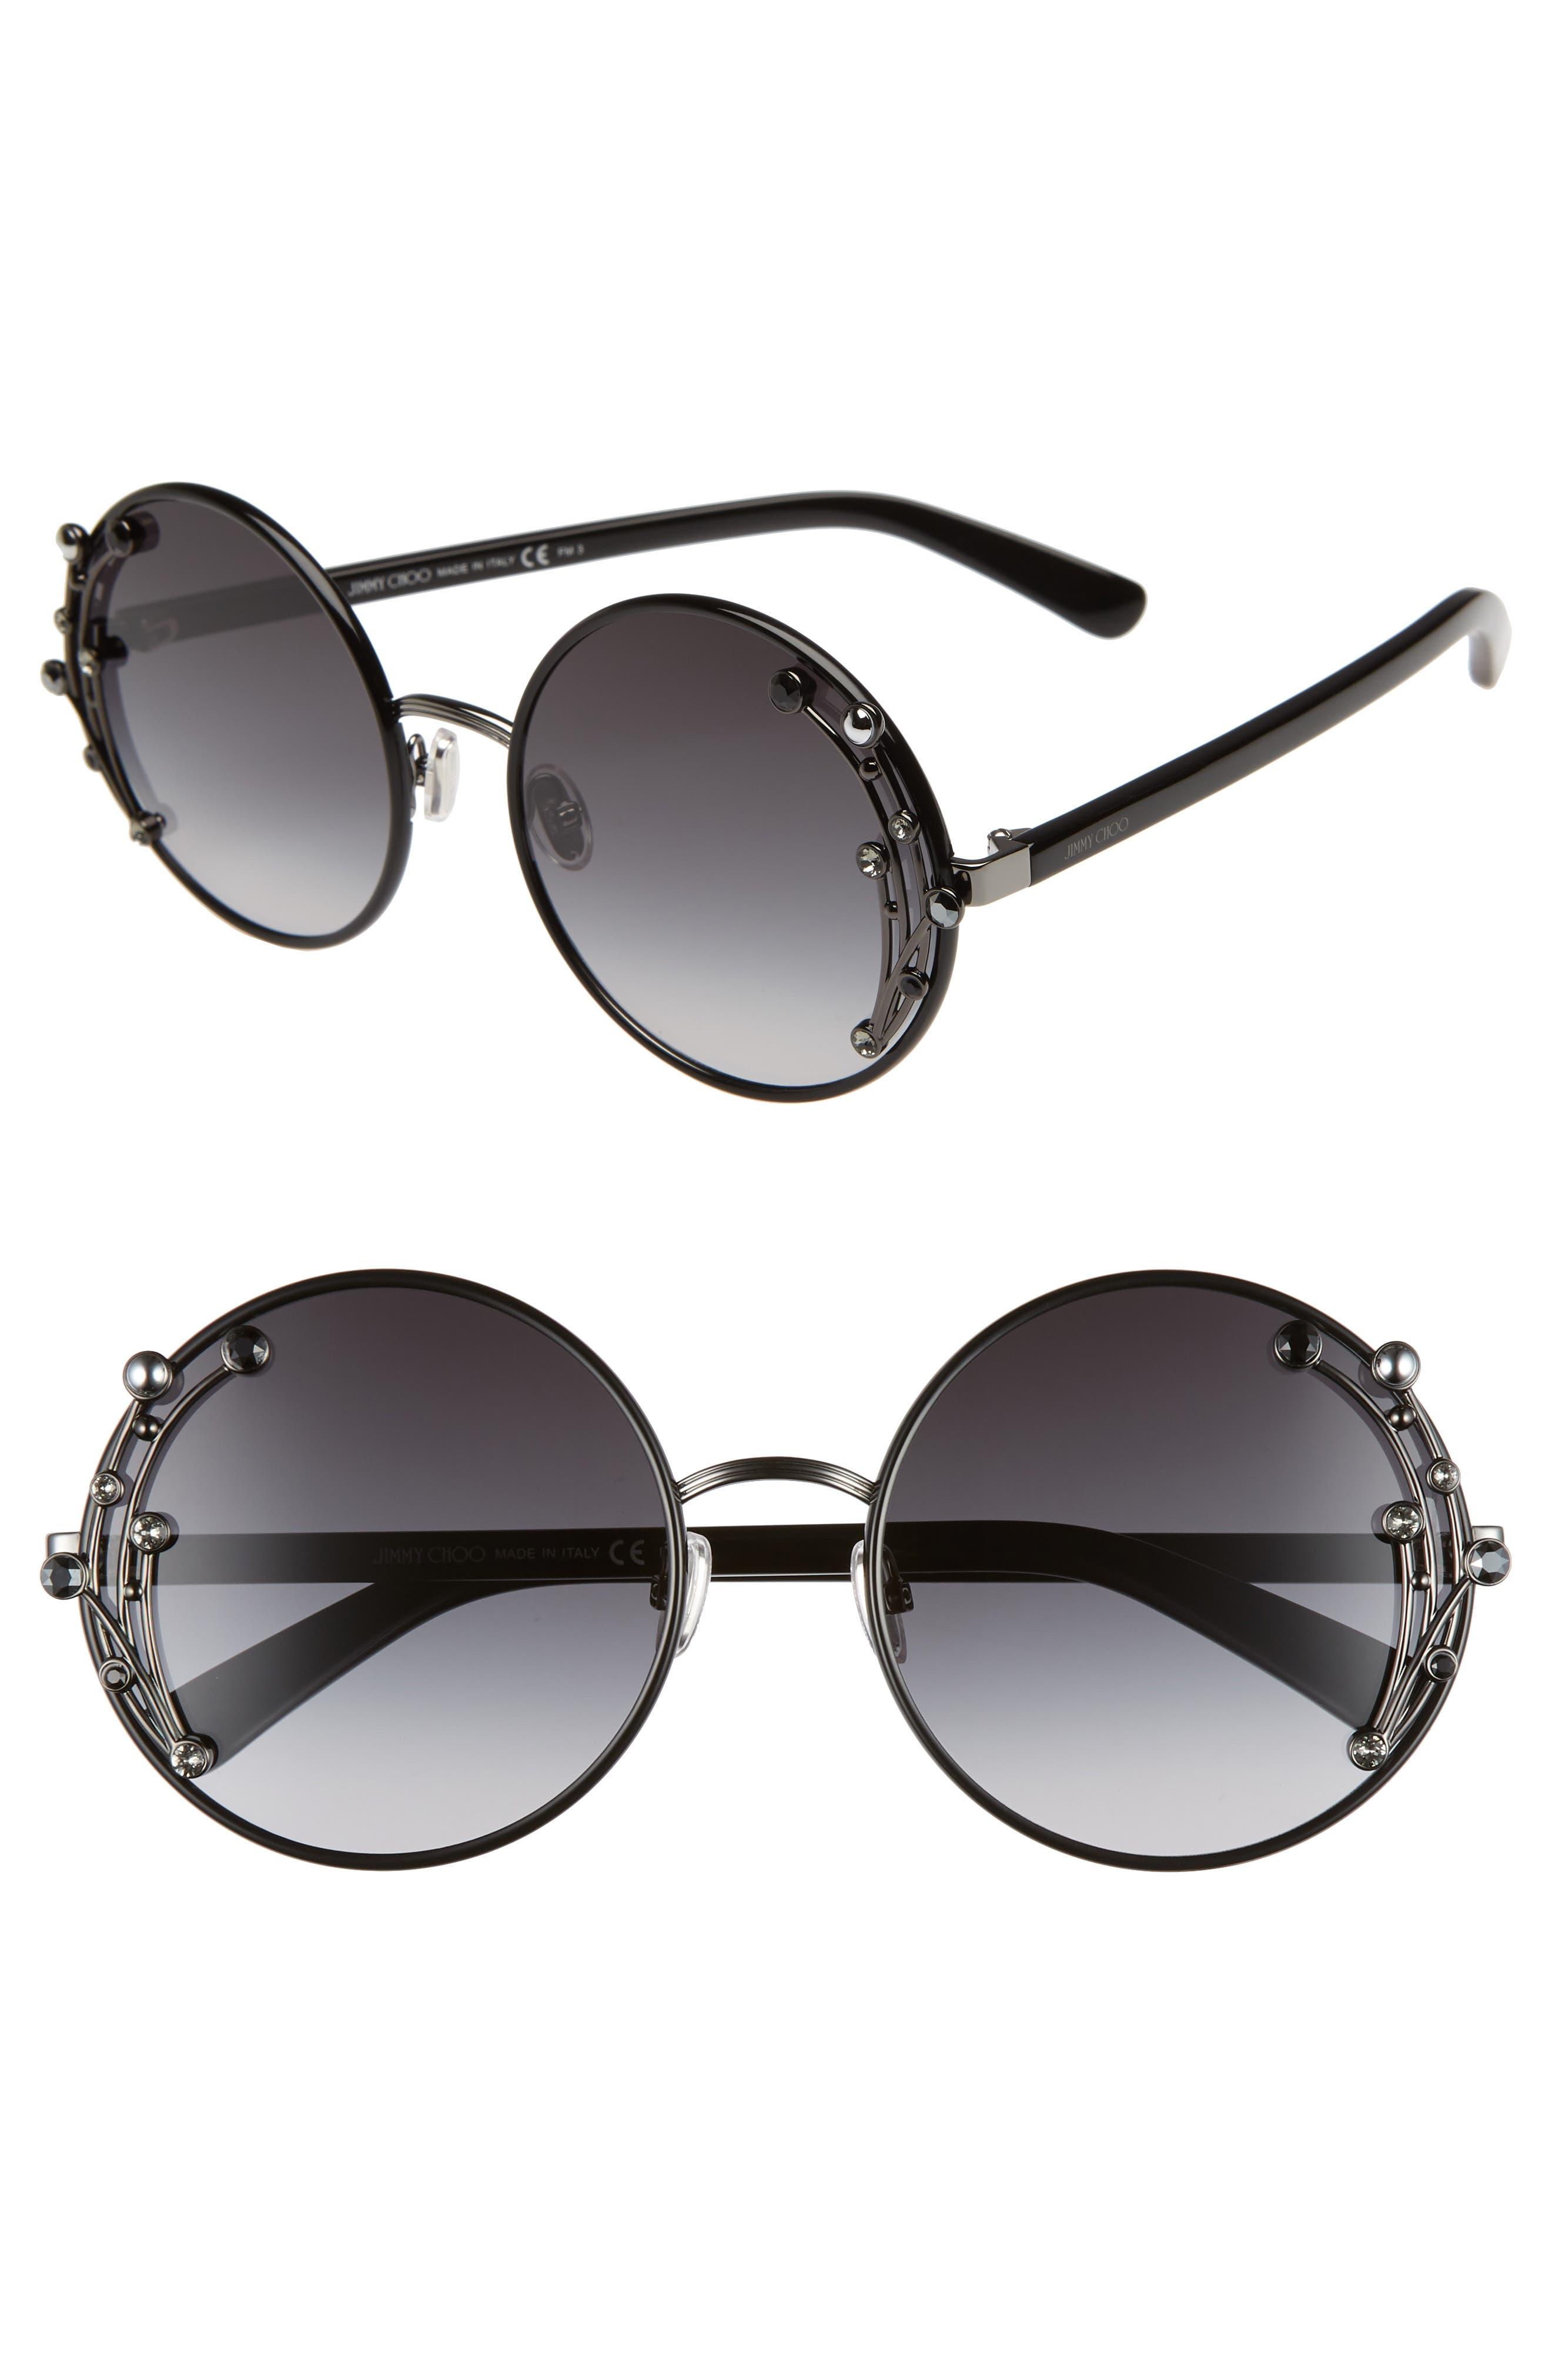 JIMMY CHOO Gema 59mm Round Sunglasses, Main, color, BLACK